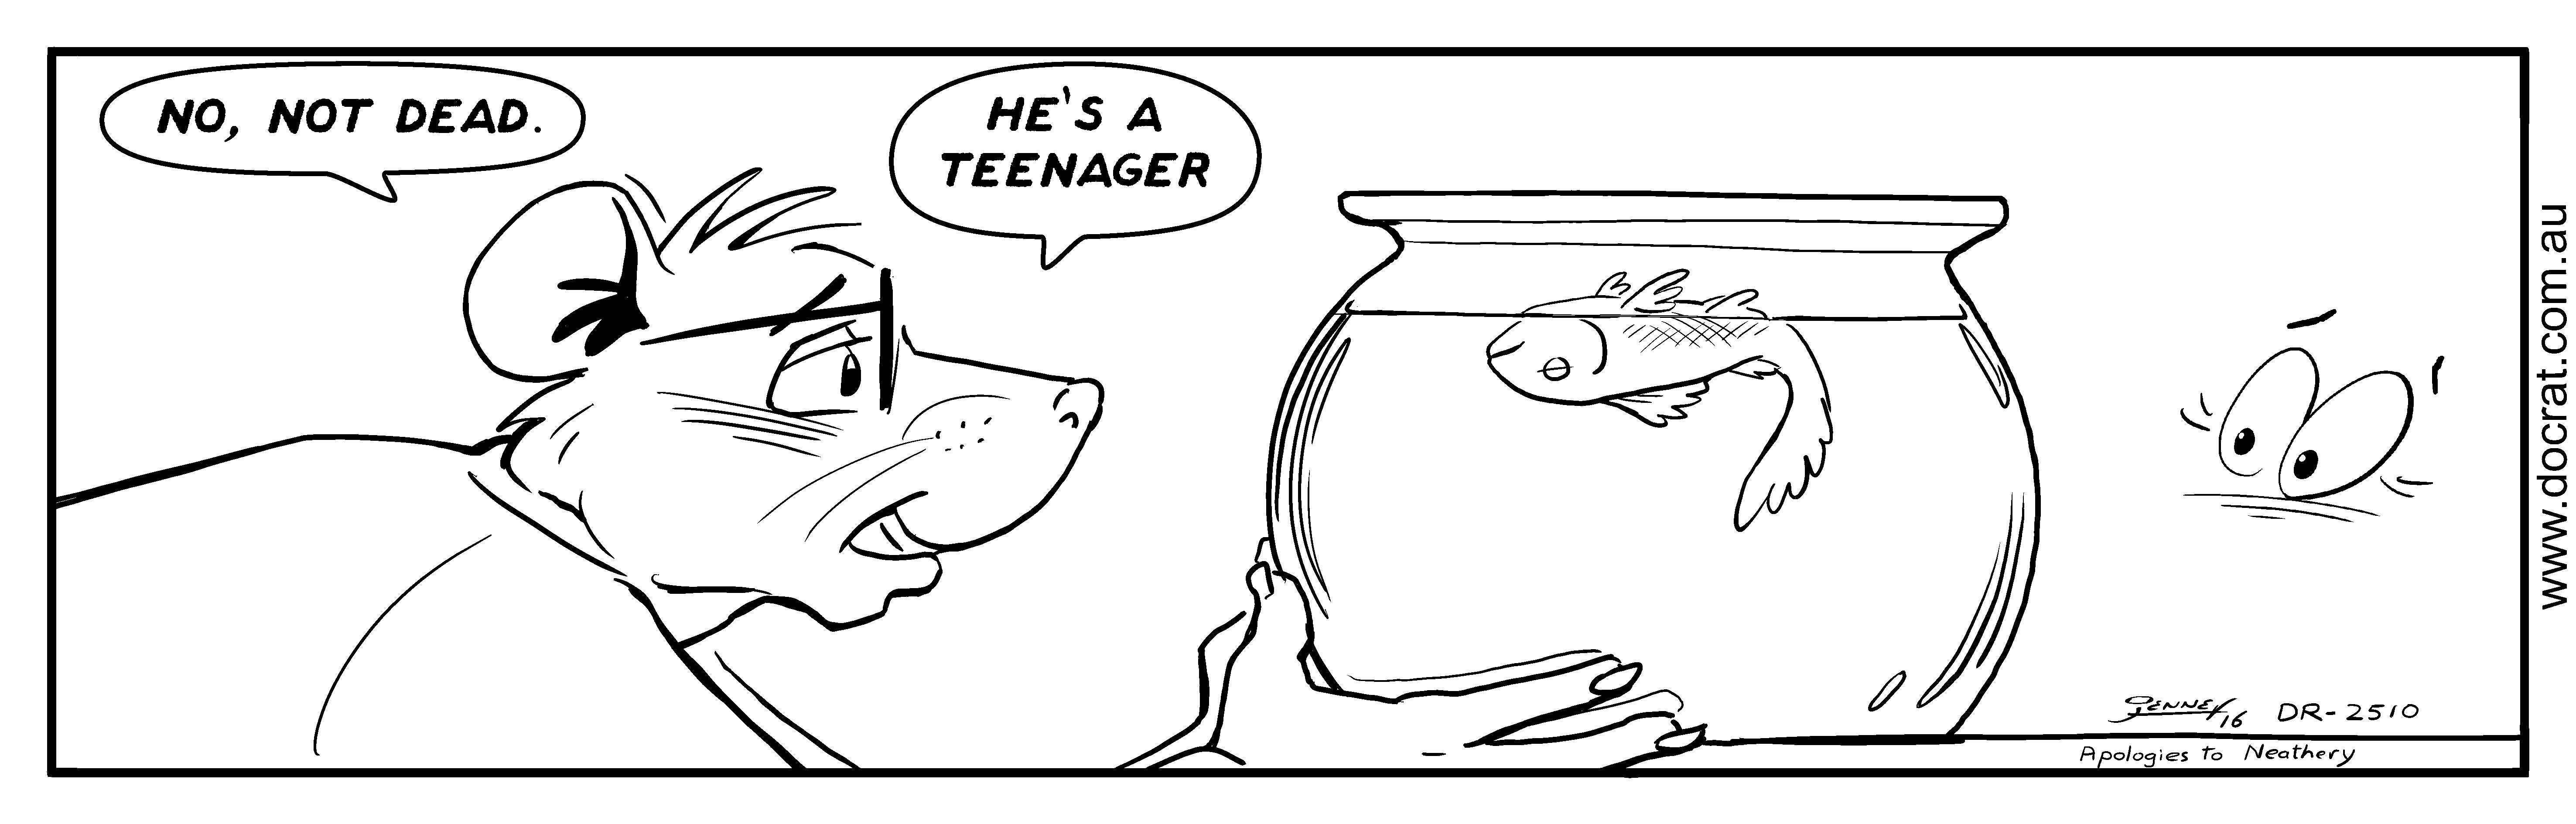 20160422